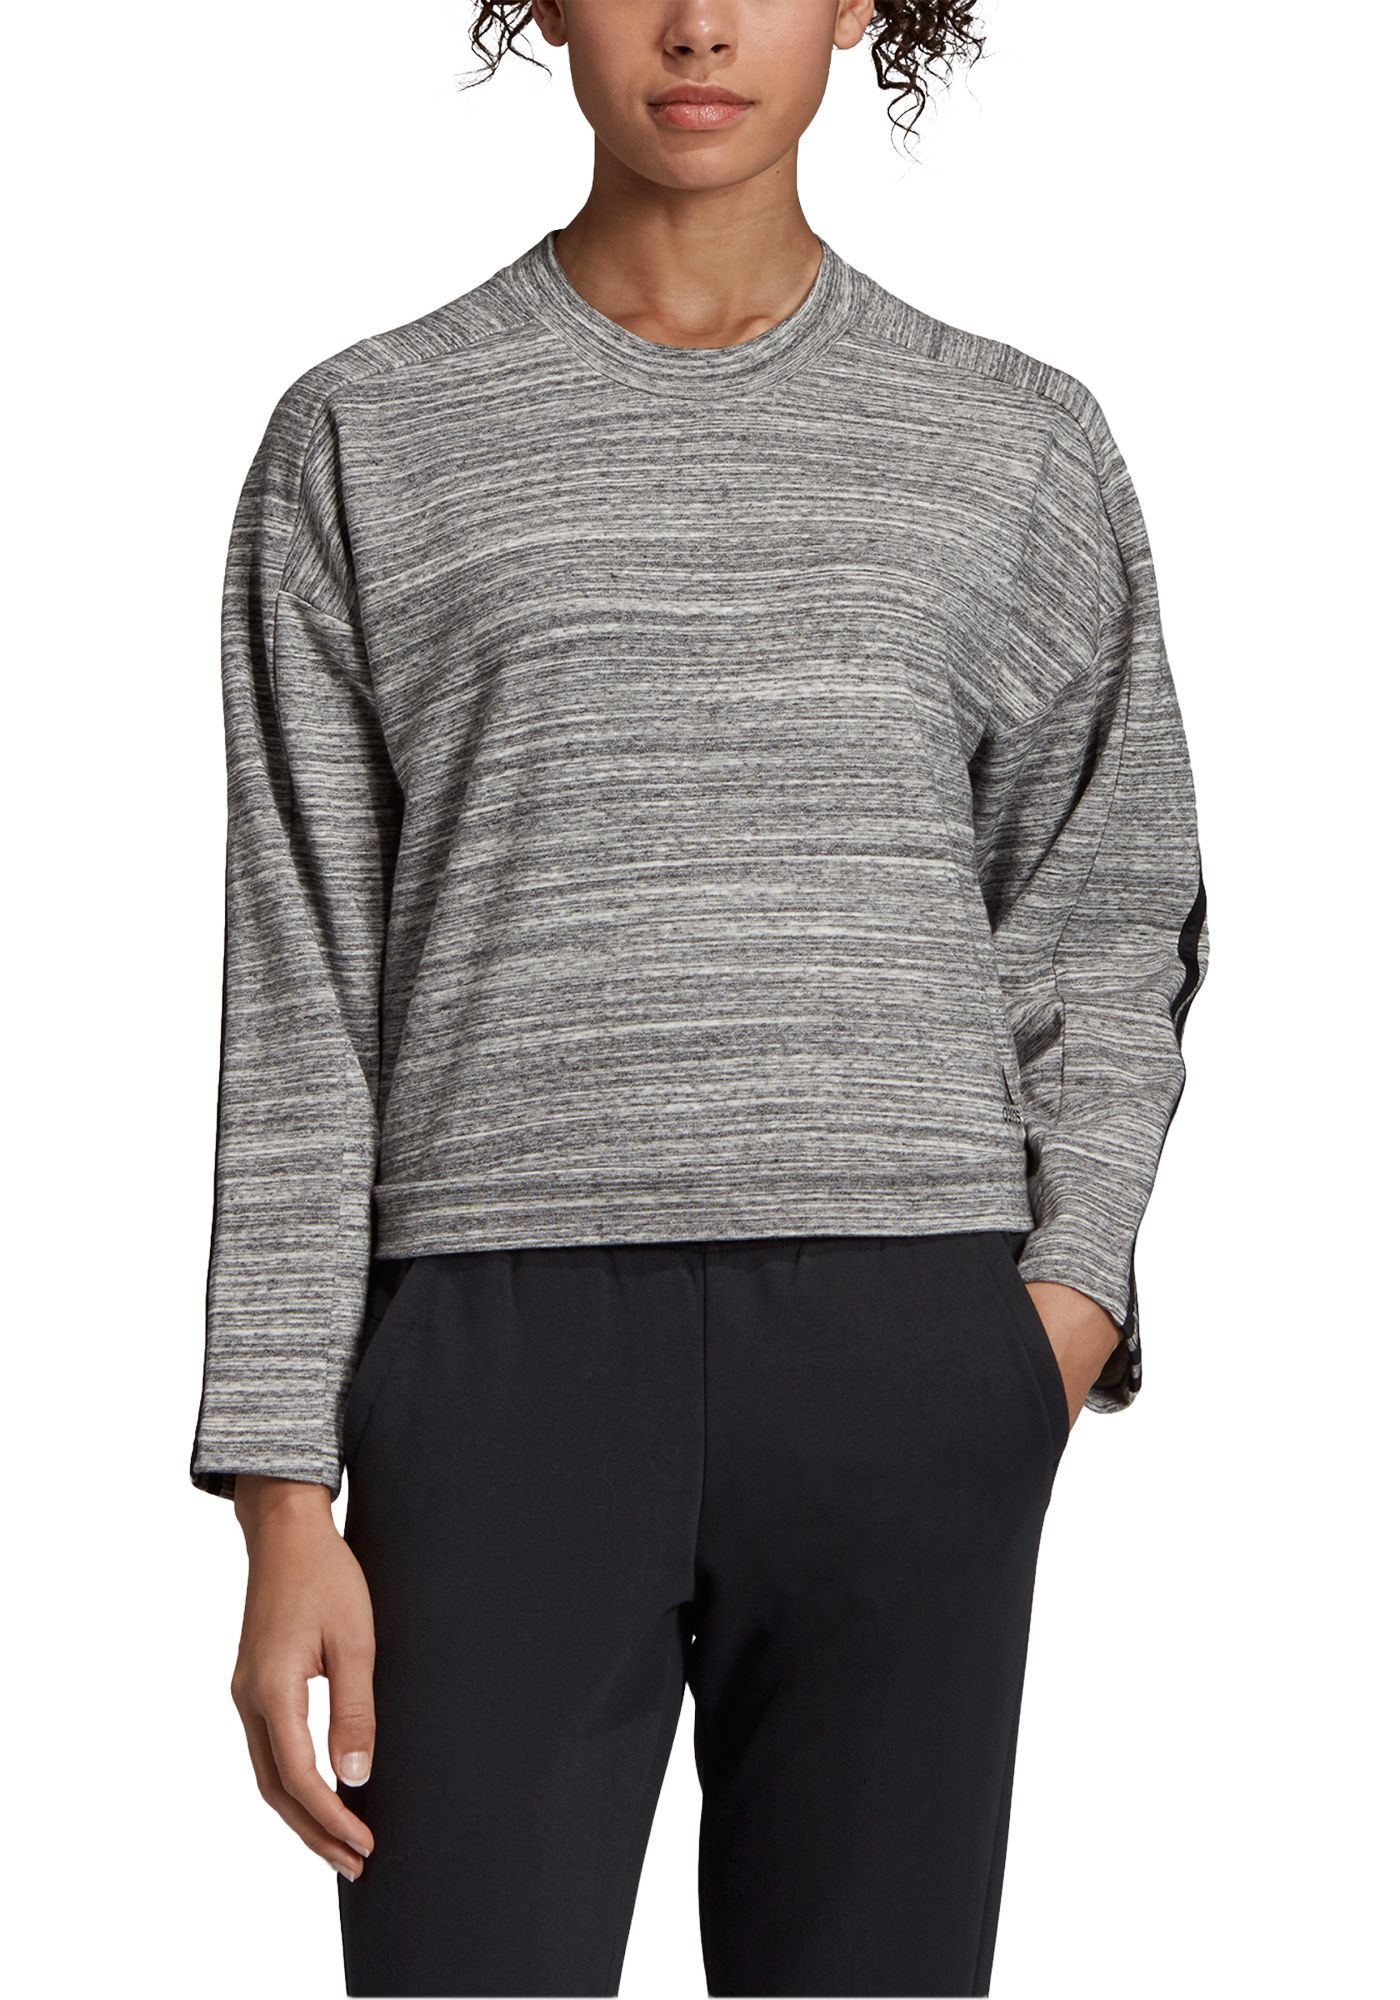 adidas Women's Must Haves Heather Crew Neck Sweatshirt